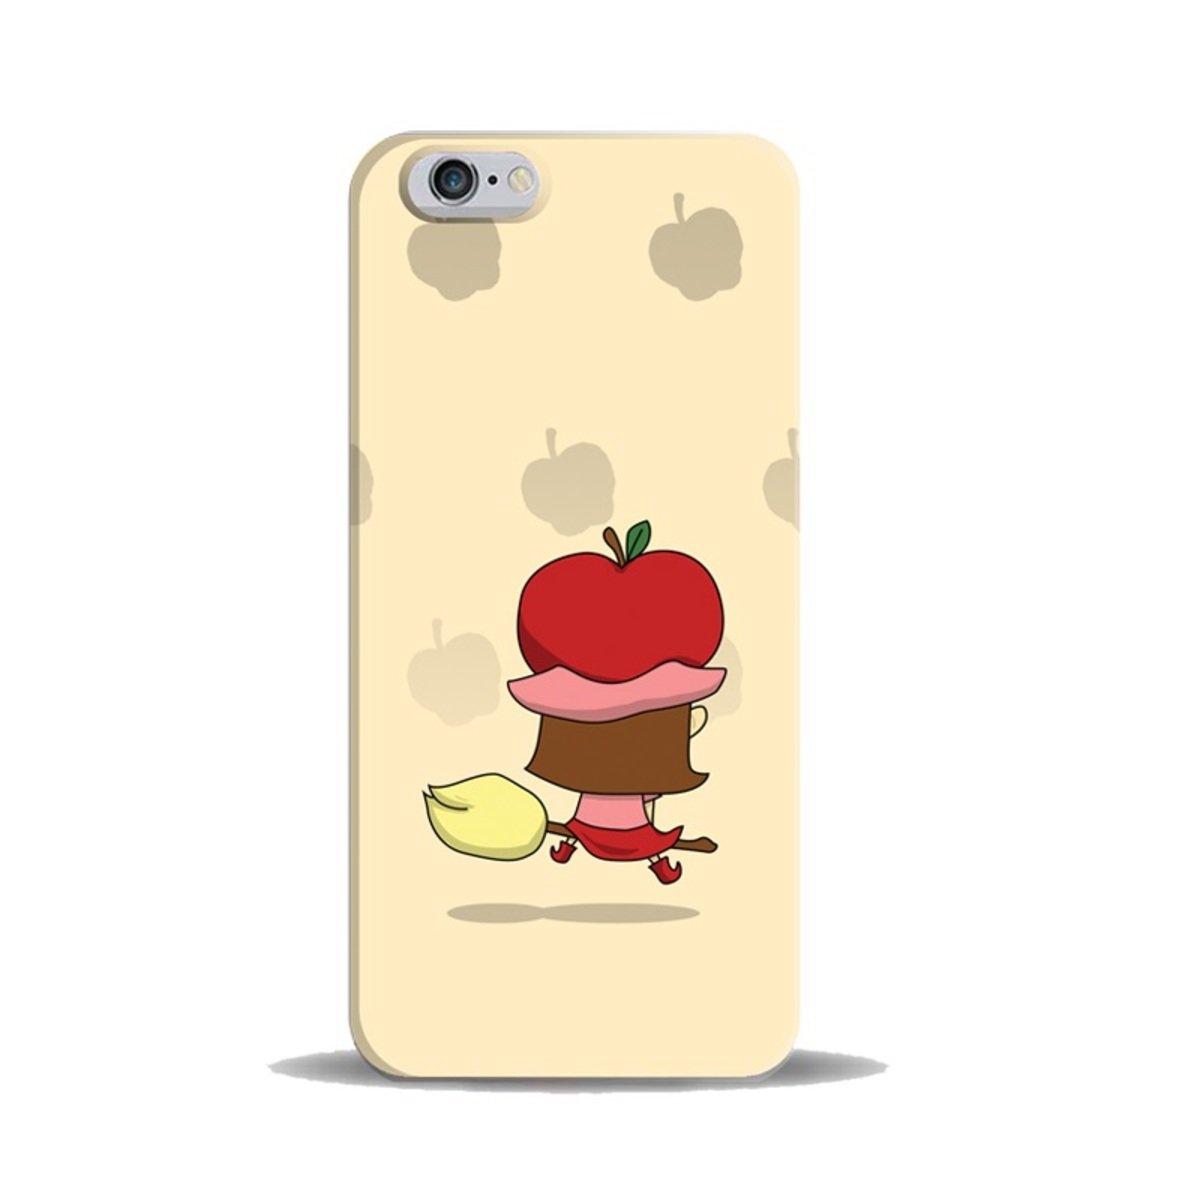 "iPhase - iPhone 6 (4.7"") 手機膠殼電話保護套 4.7寸 (Apple) (另有適合iPhone 6 Plus 5.5寸型號)"